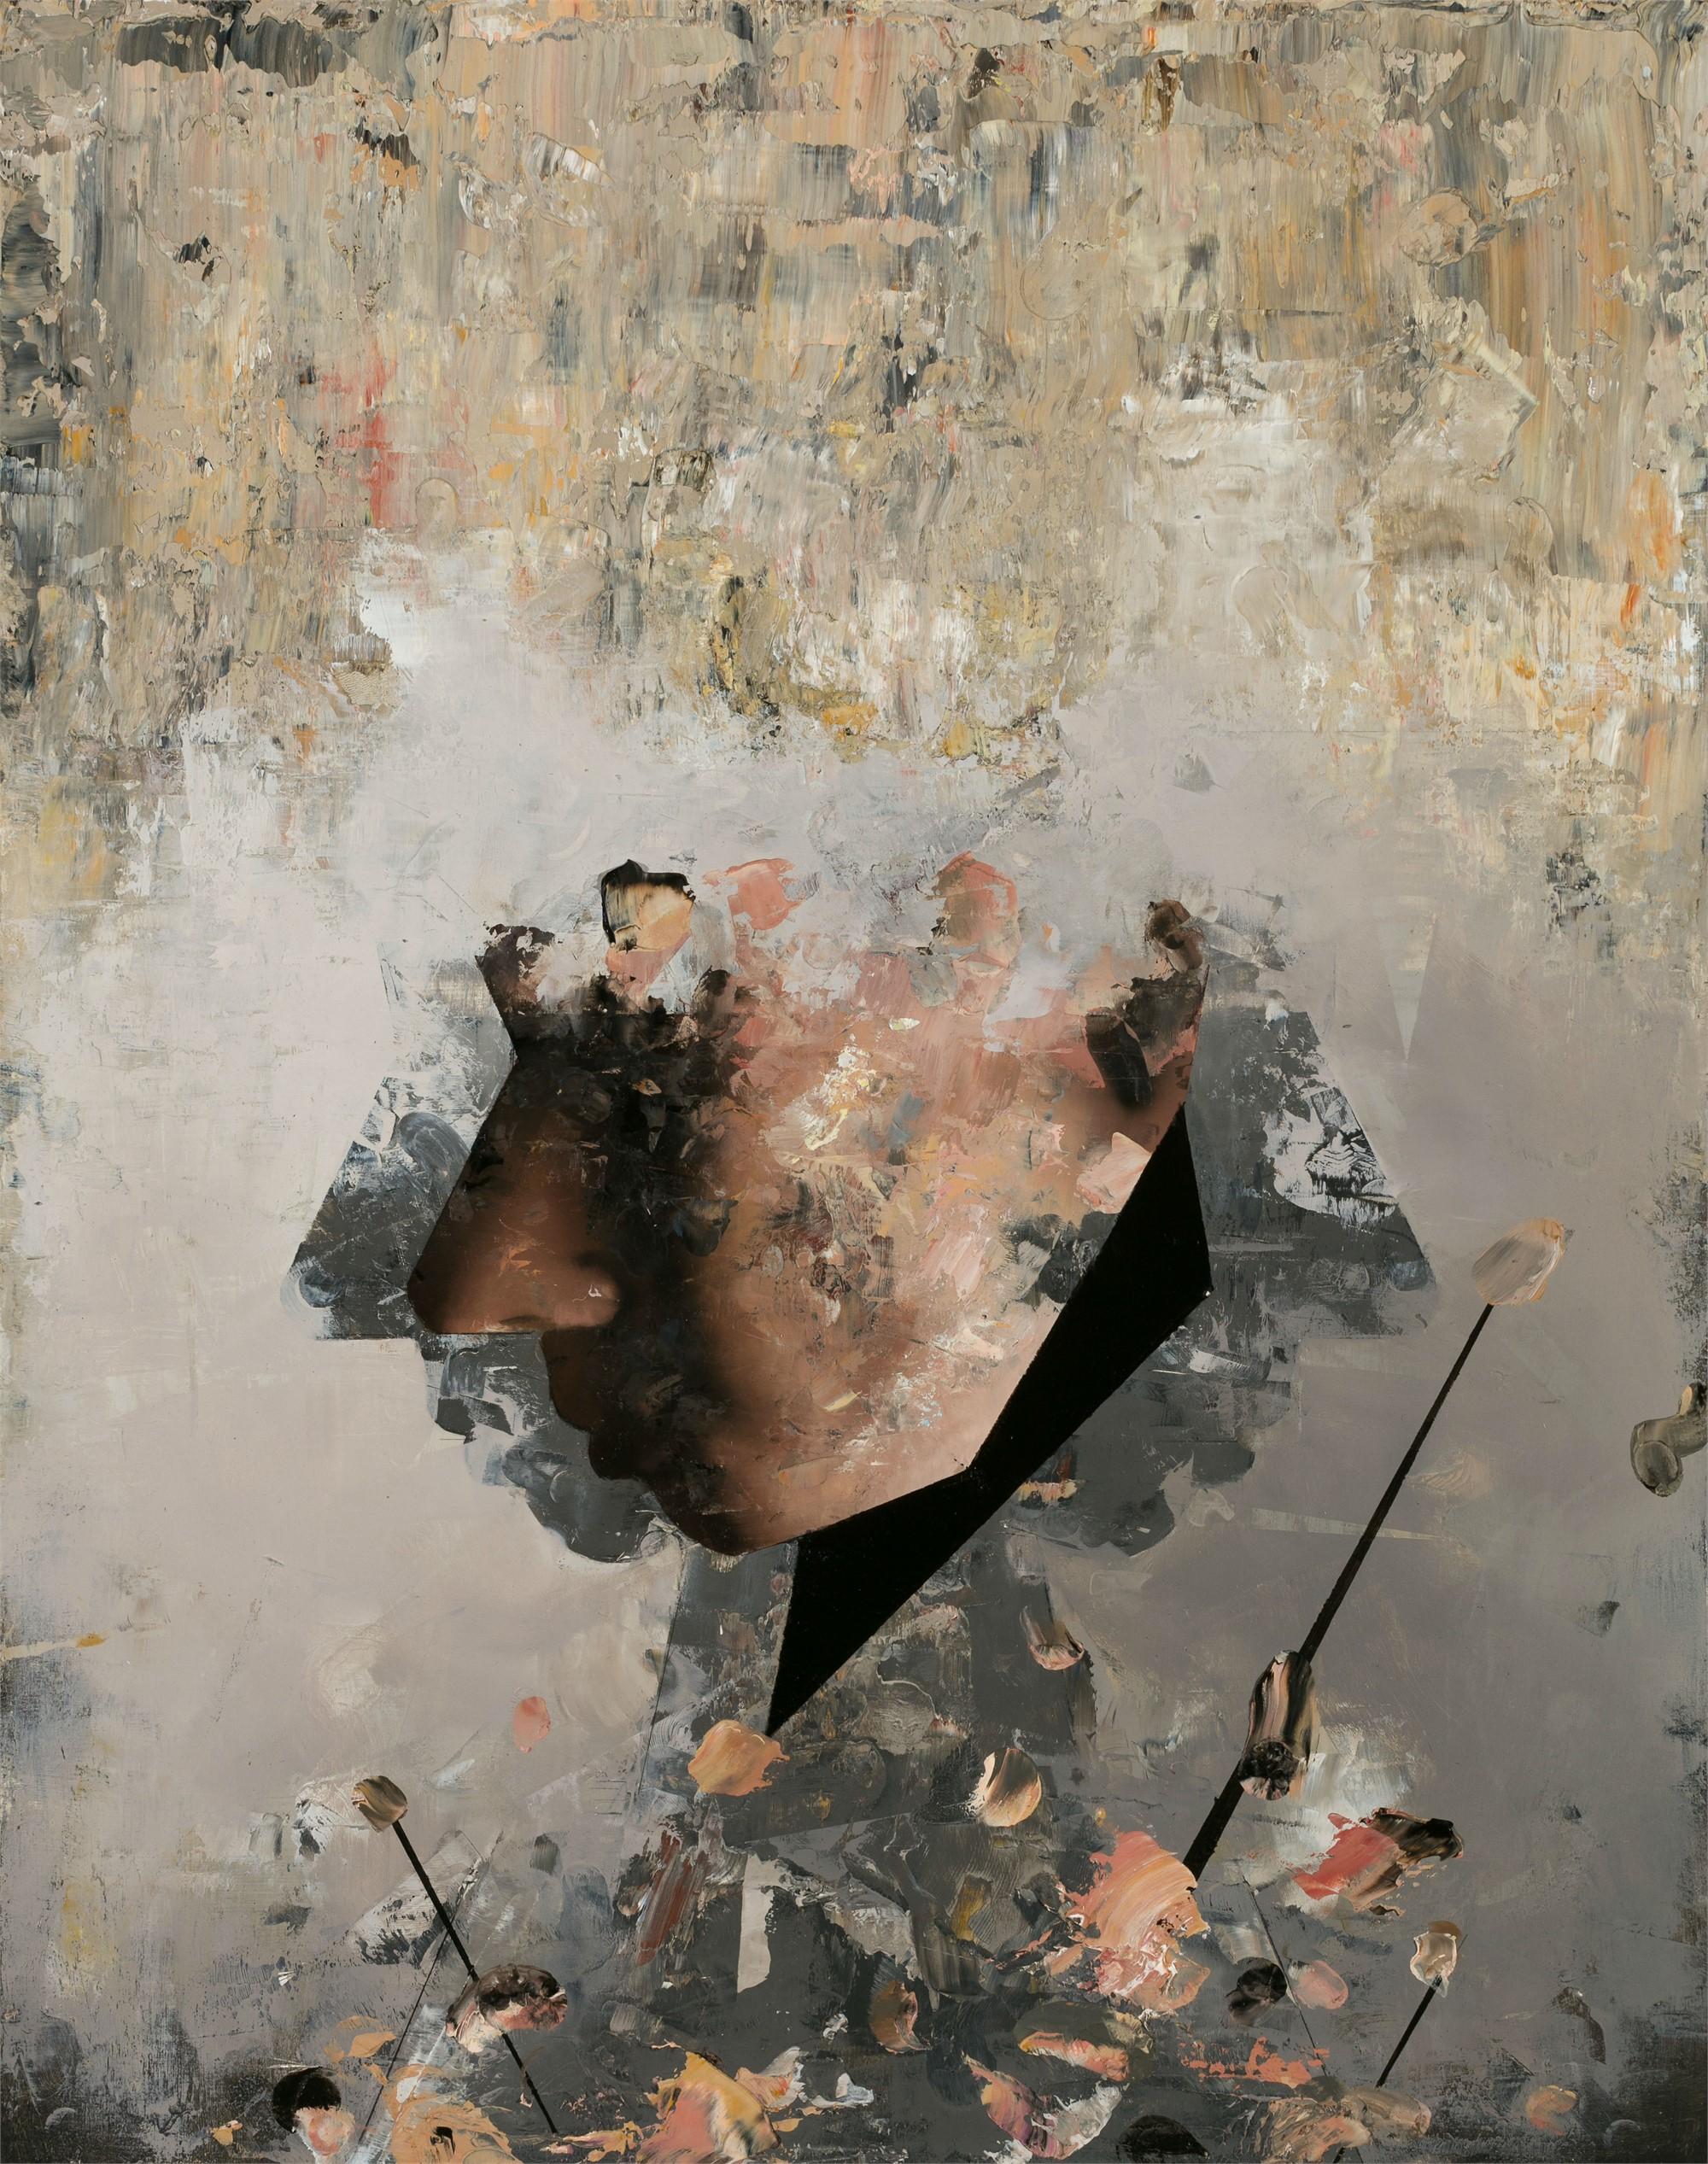 Iconoclast by Matthew Saba